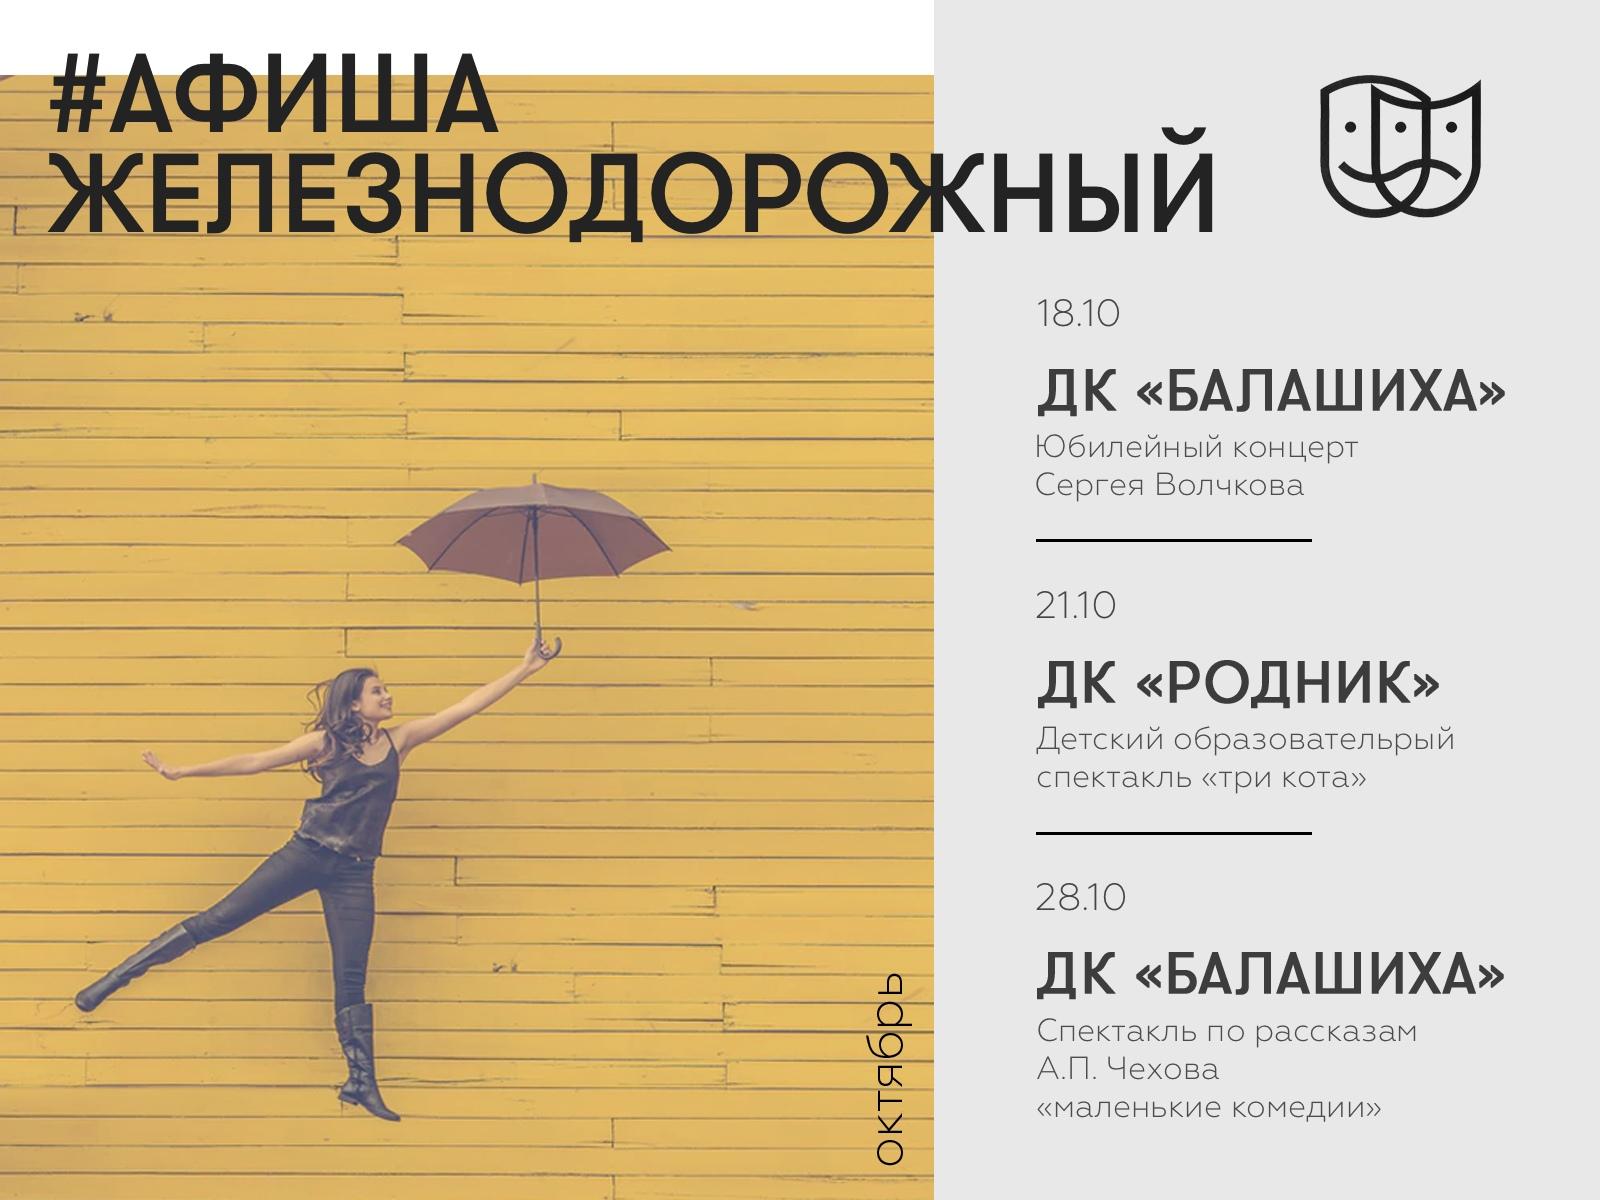 Ремонт москвича 412 своими руками фото 534